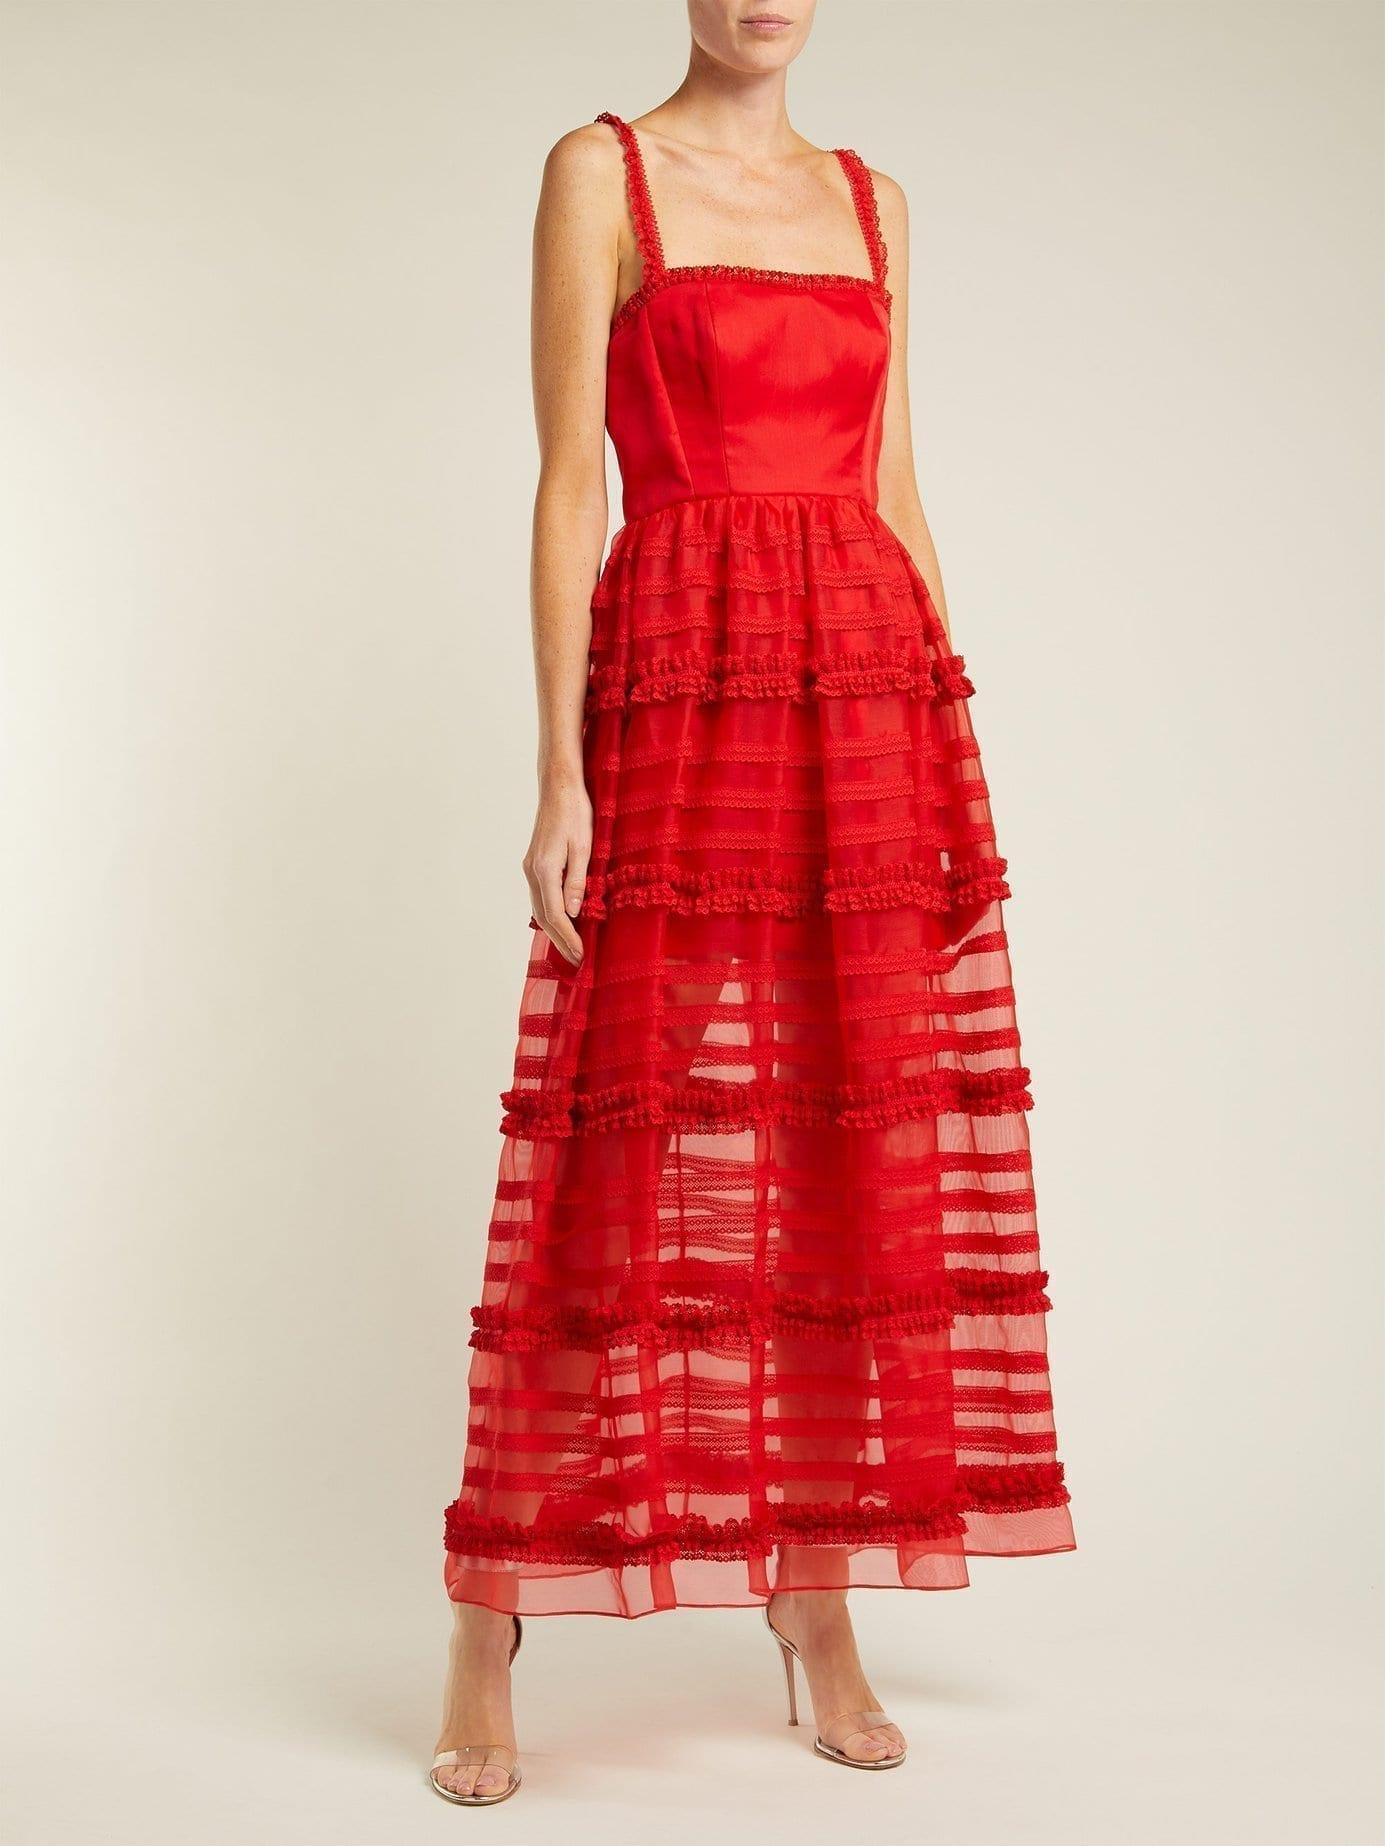 EMILIO DE LA MORENA Jade Silk And Lace Red Gown - We Select Dresses